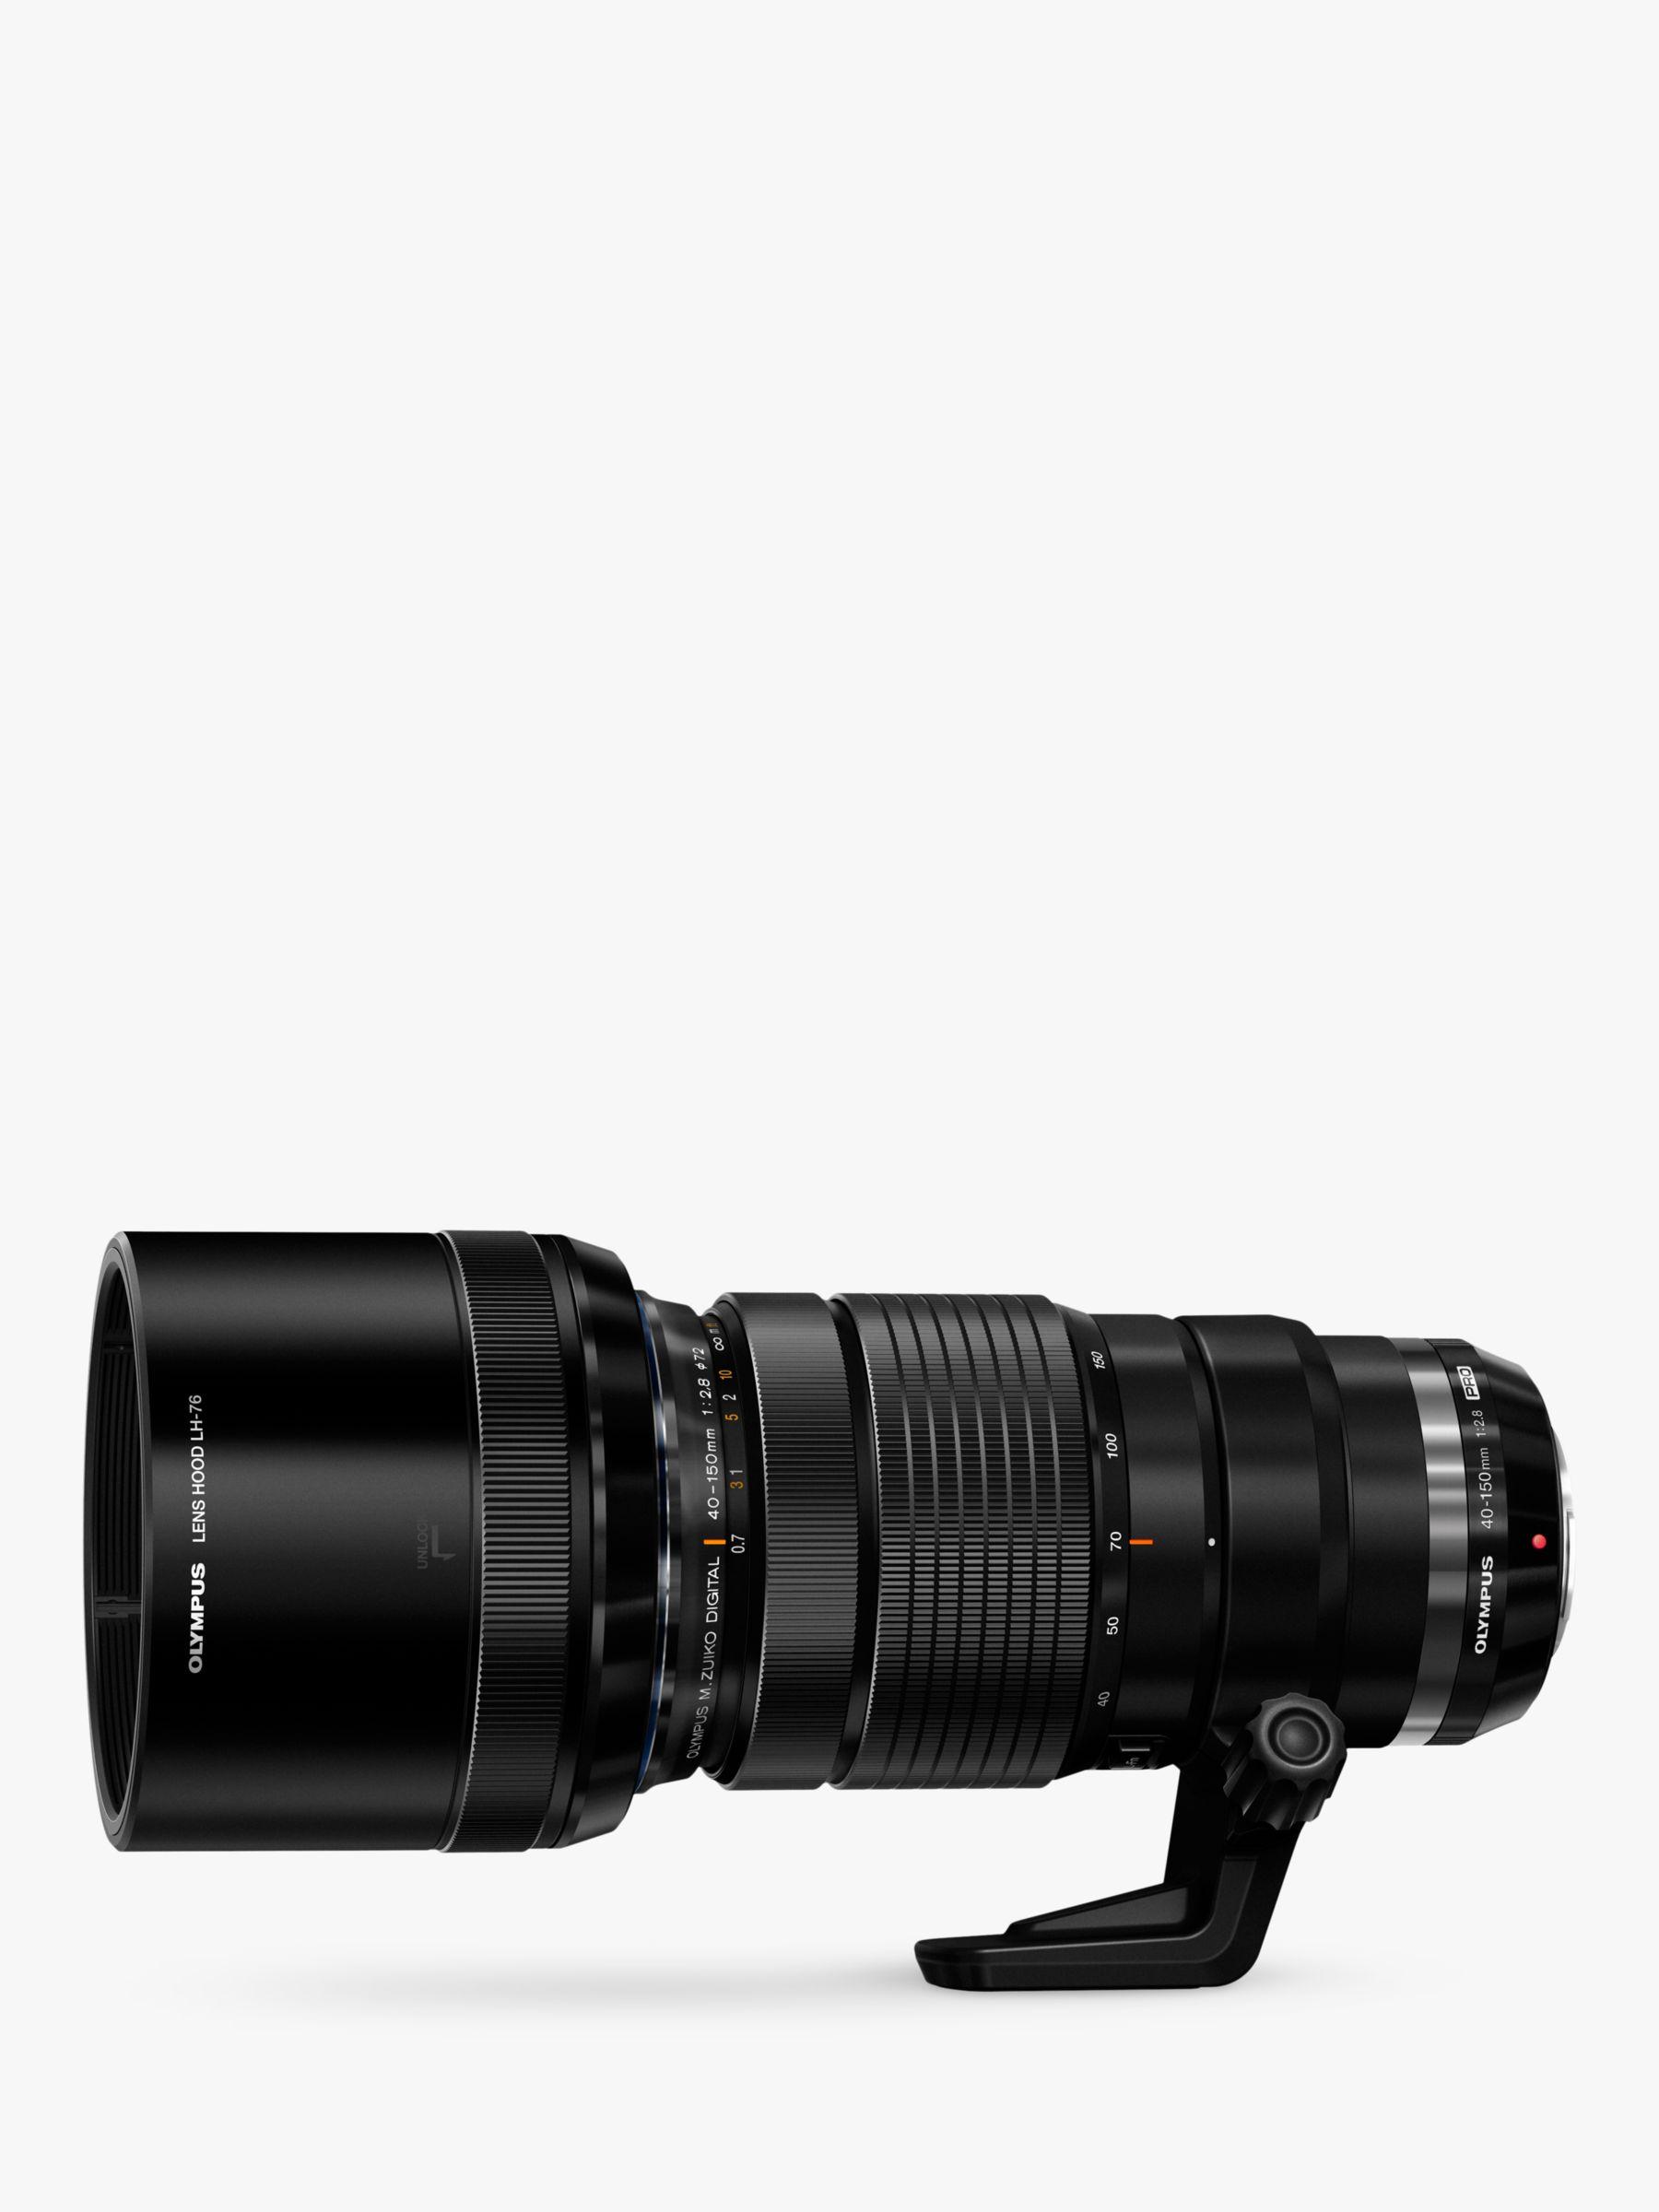 Olympus Olympus M.ZUIKO DIGITAL 40-150mm f/2.8 ED Pro Telephoto Lens